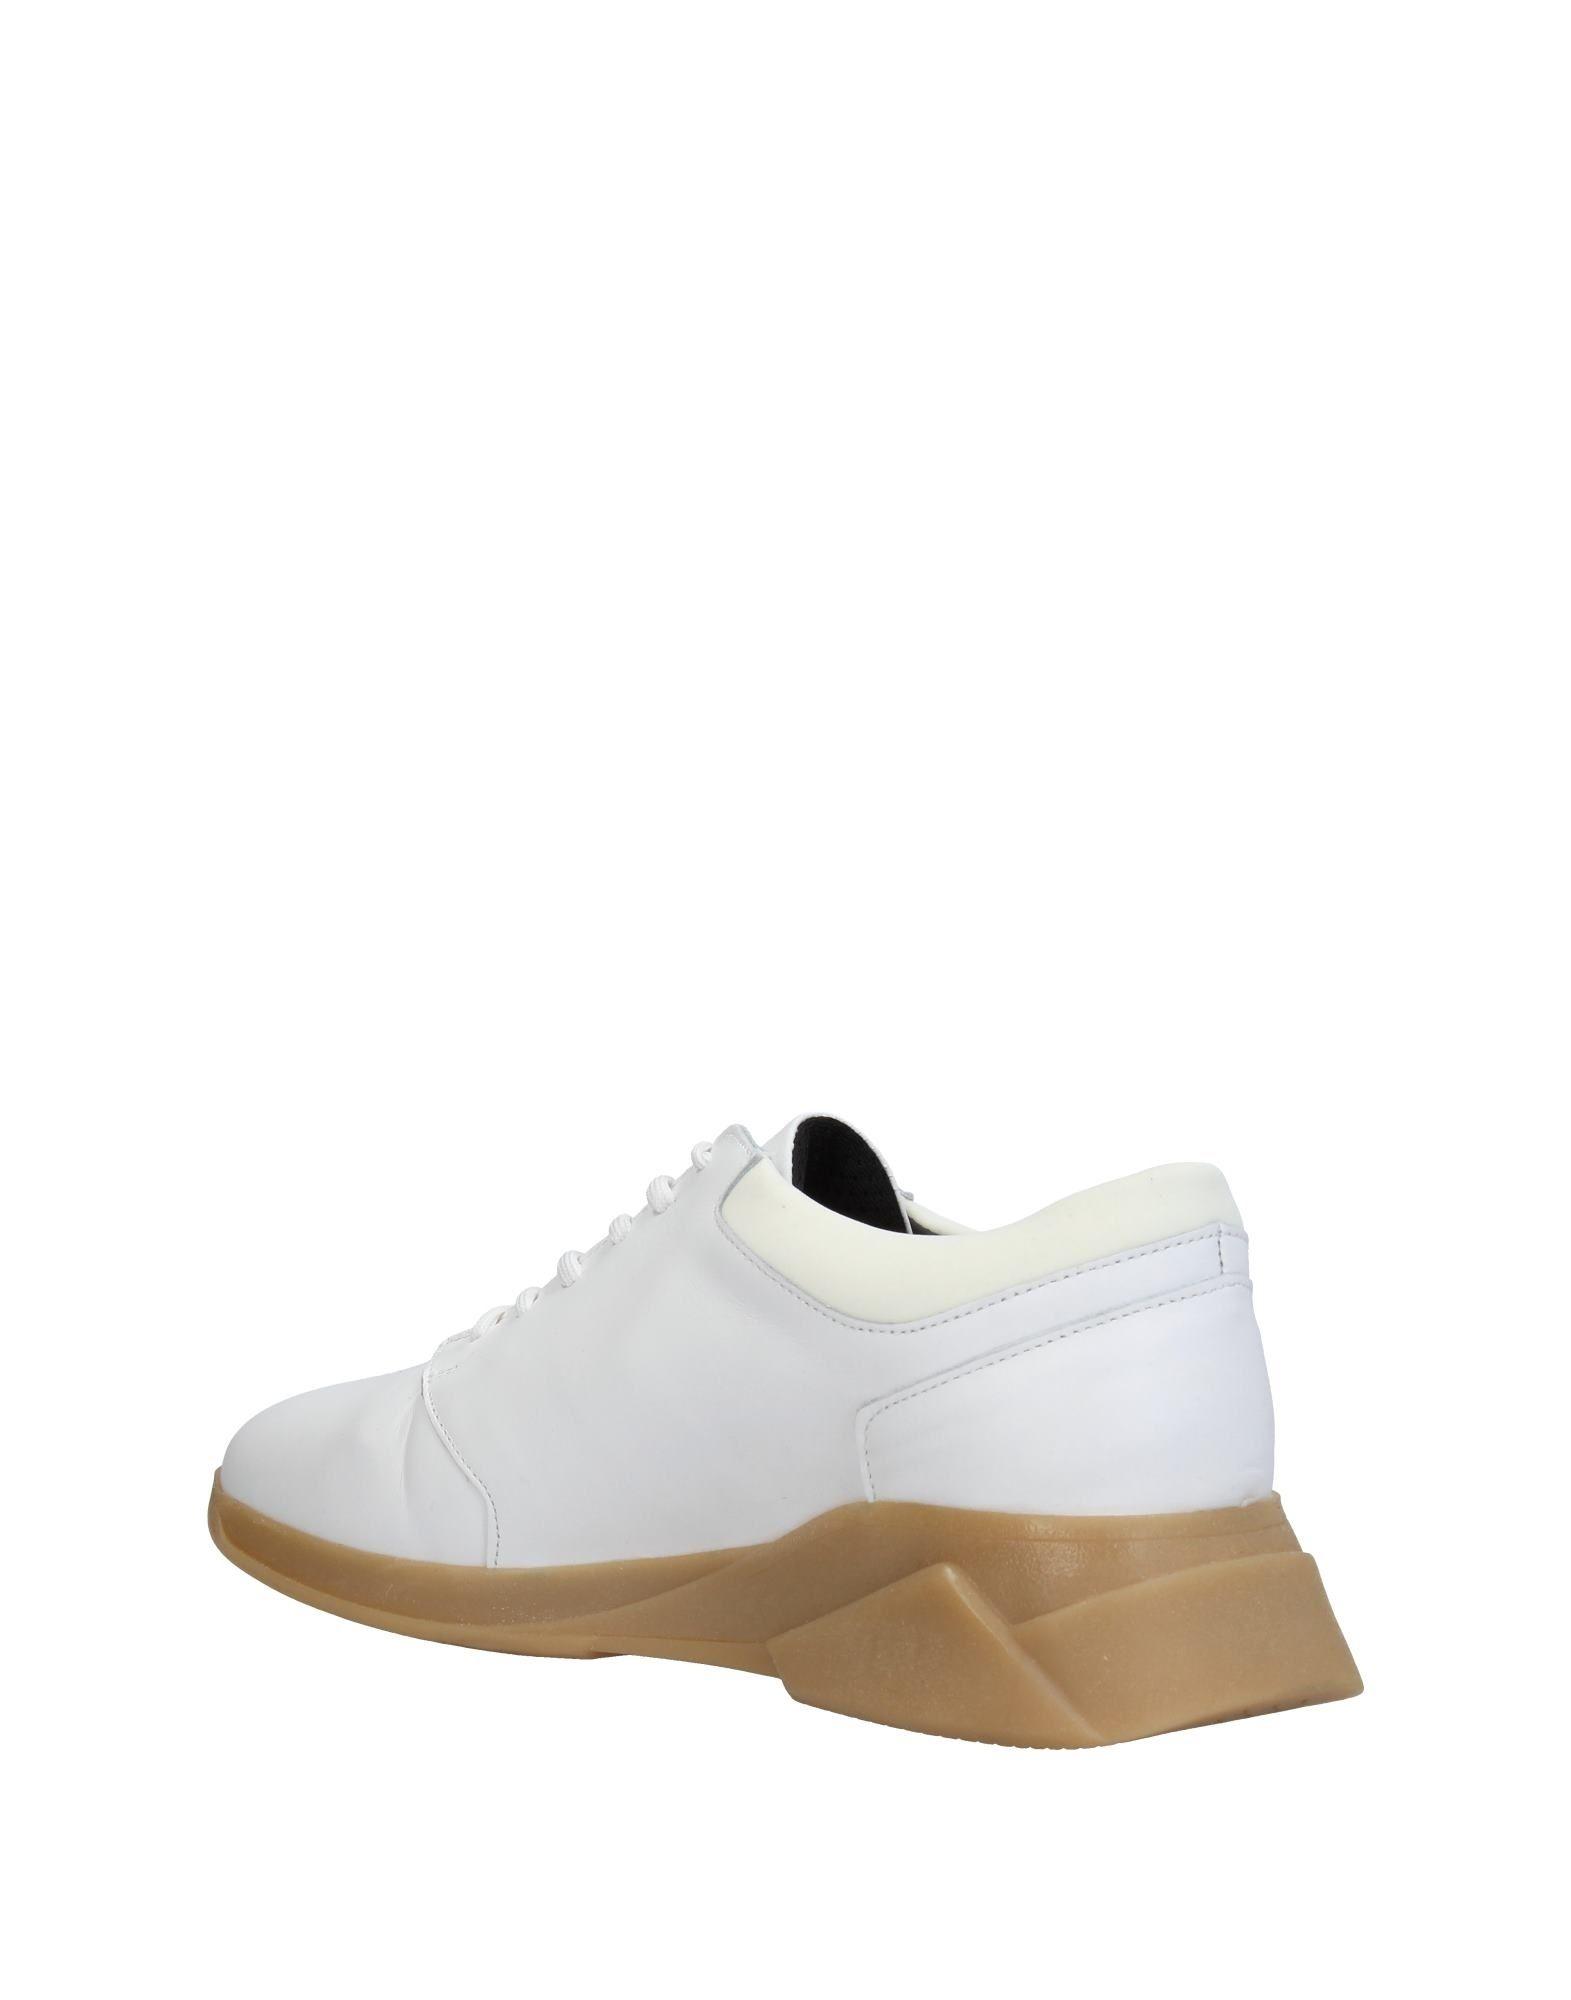 Sneakers Royal Republiq Homme - Sneakers Royal Republiq sur